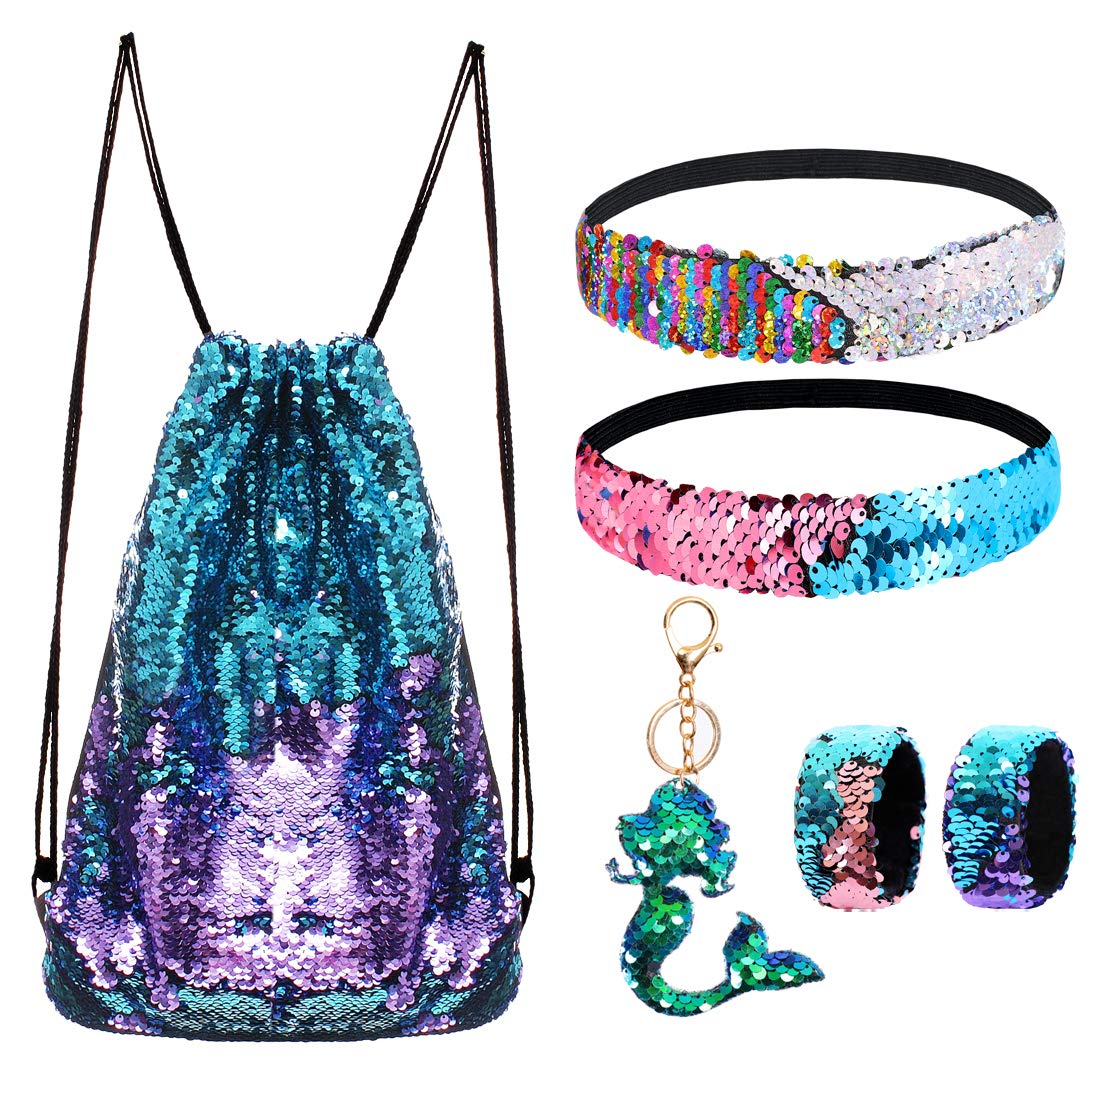 Mermaid Reversible Sequin Drawstring Backpack